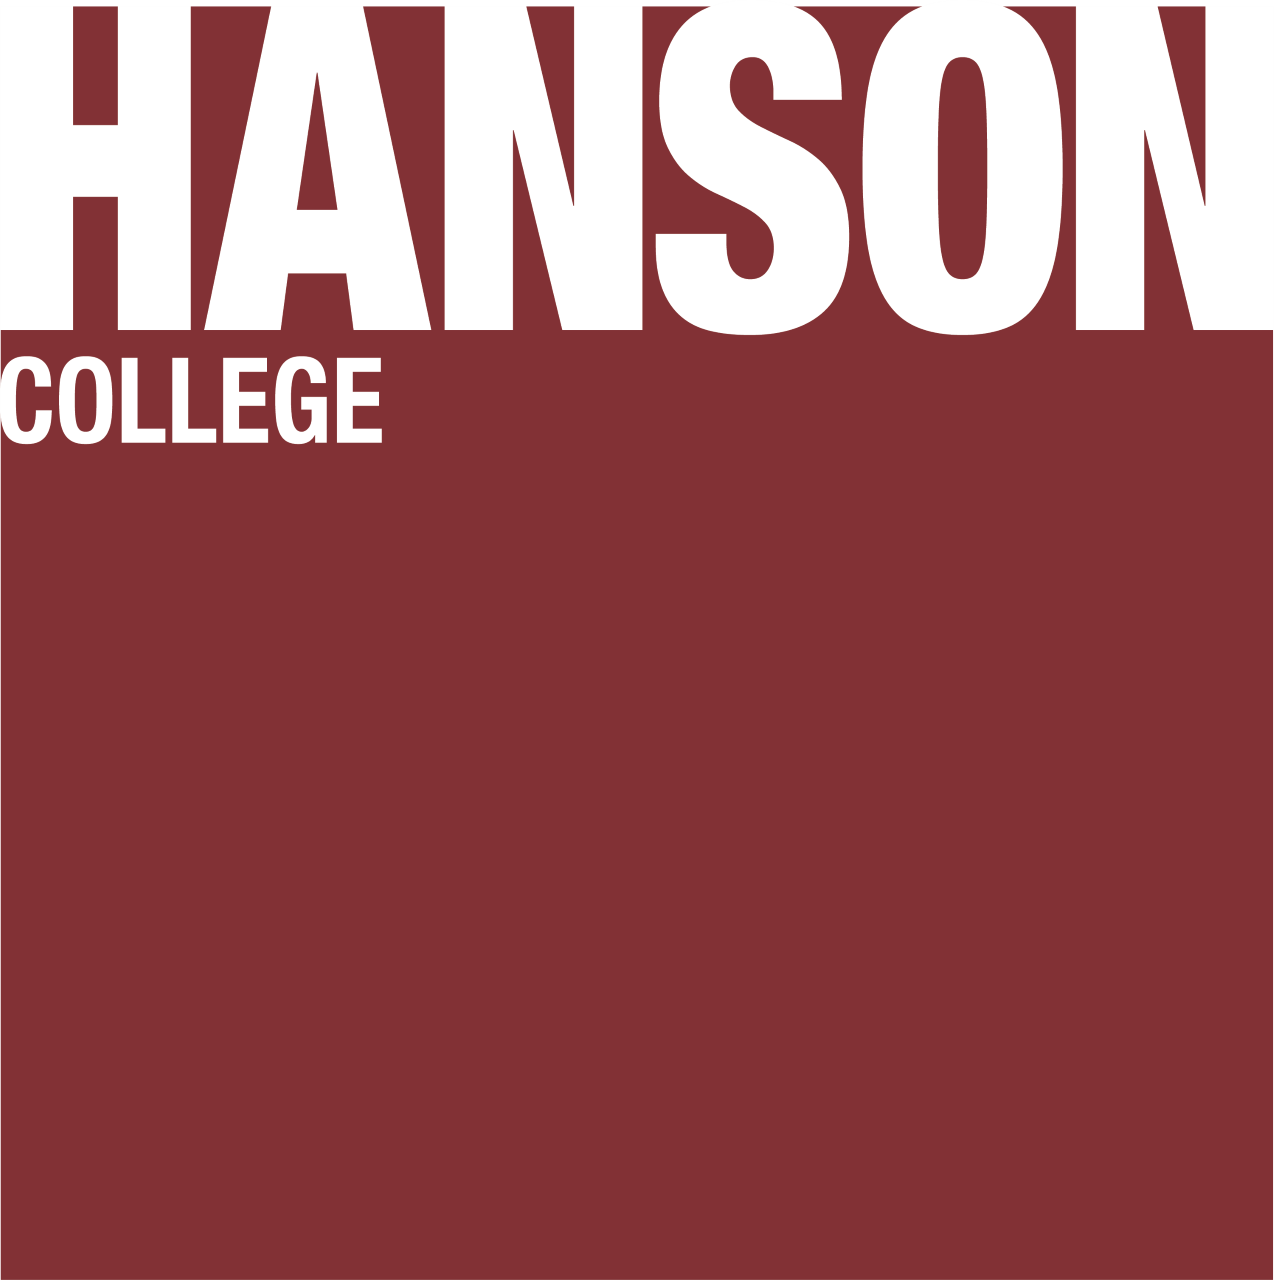 Hanson College's